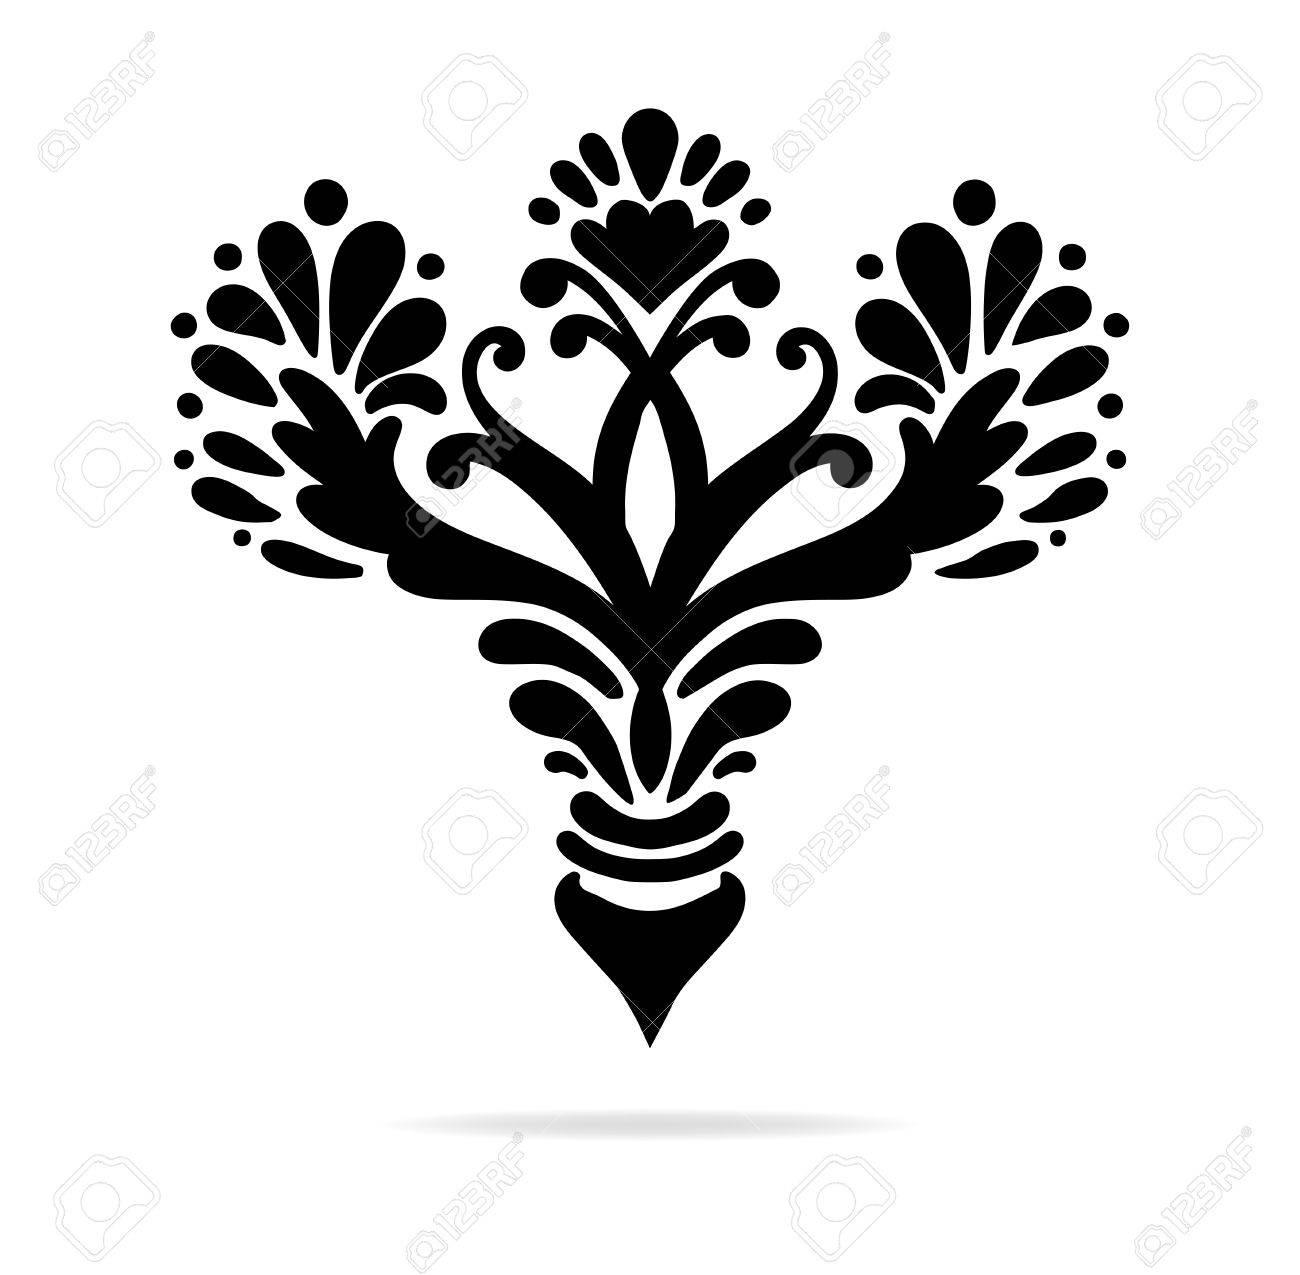 Elegant hand drawn fleur de lis symbols in ornate stylized design elegant hand drawn fleur de lis symbols in ornate stylized design elements fancy paragraph or biocorpaavc Images